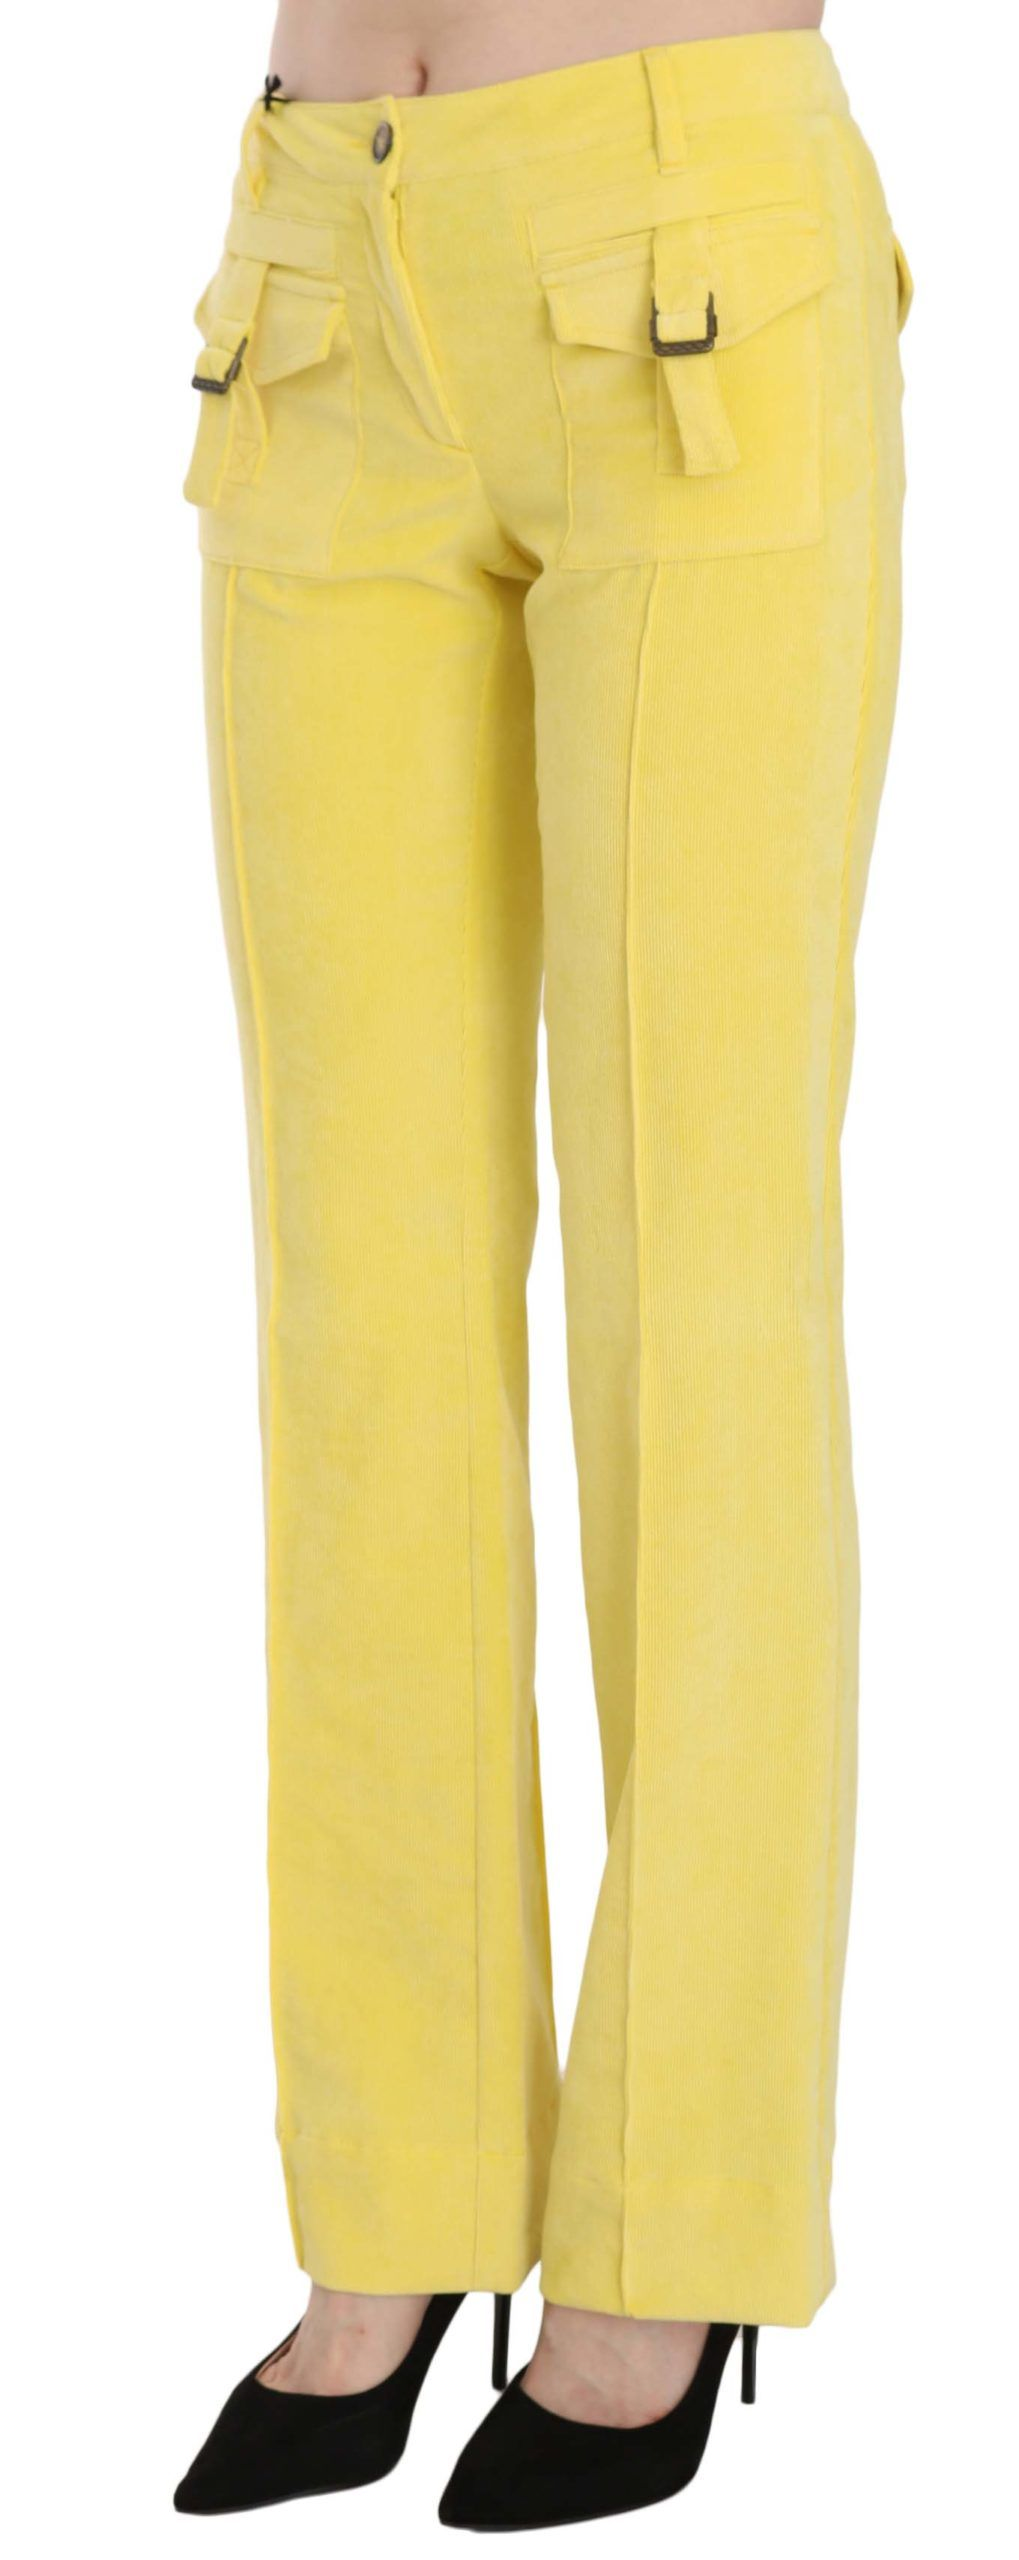 Just Cavalli Yellow Corduroy Mid Waist Straight Trousers Pants